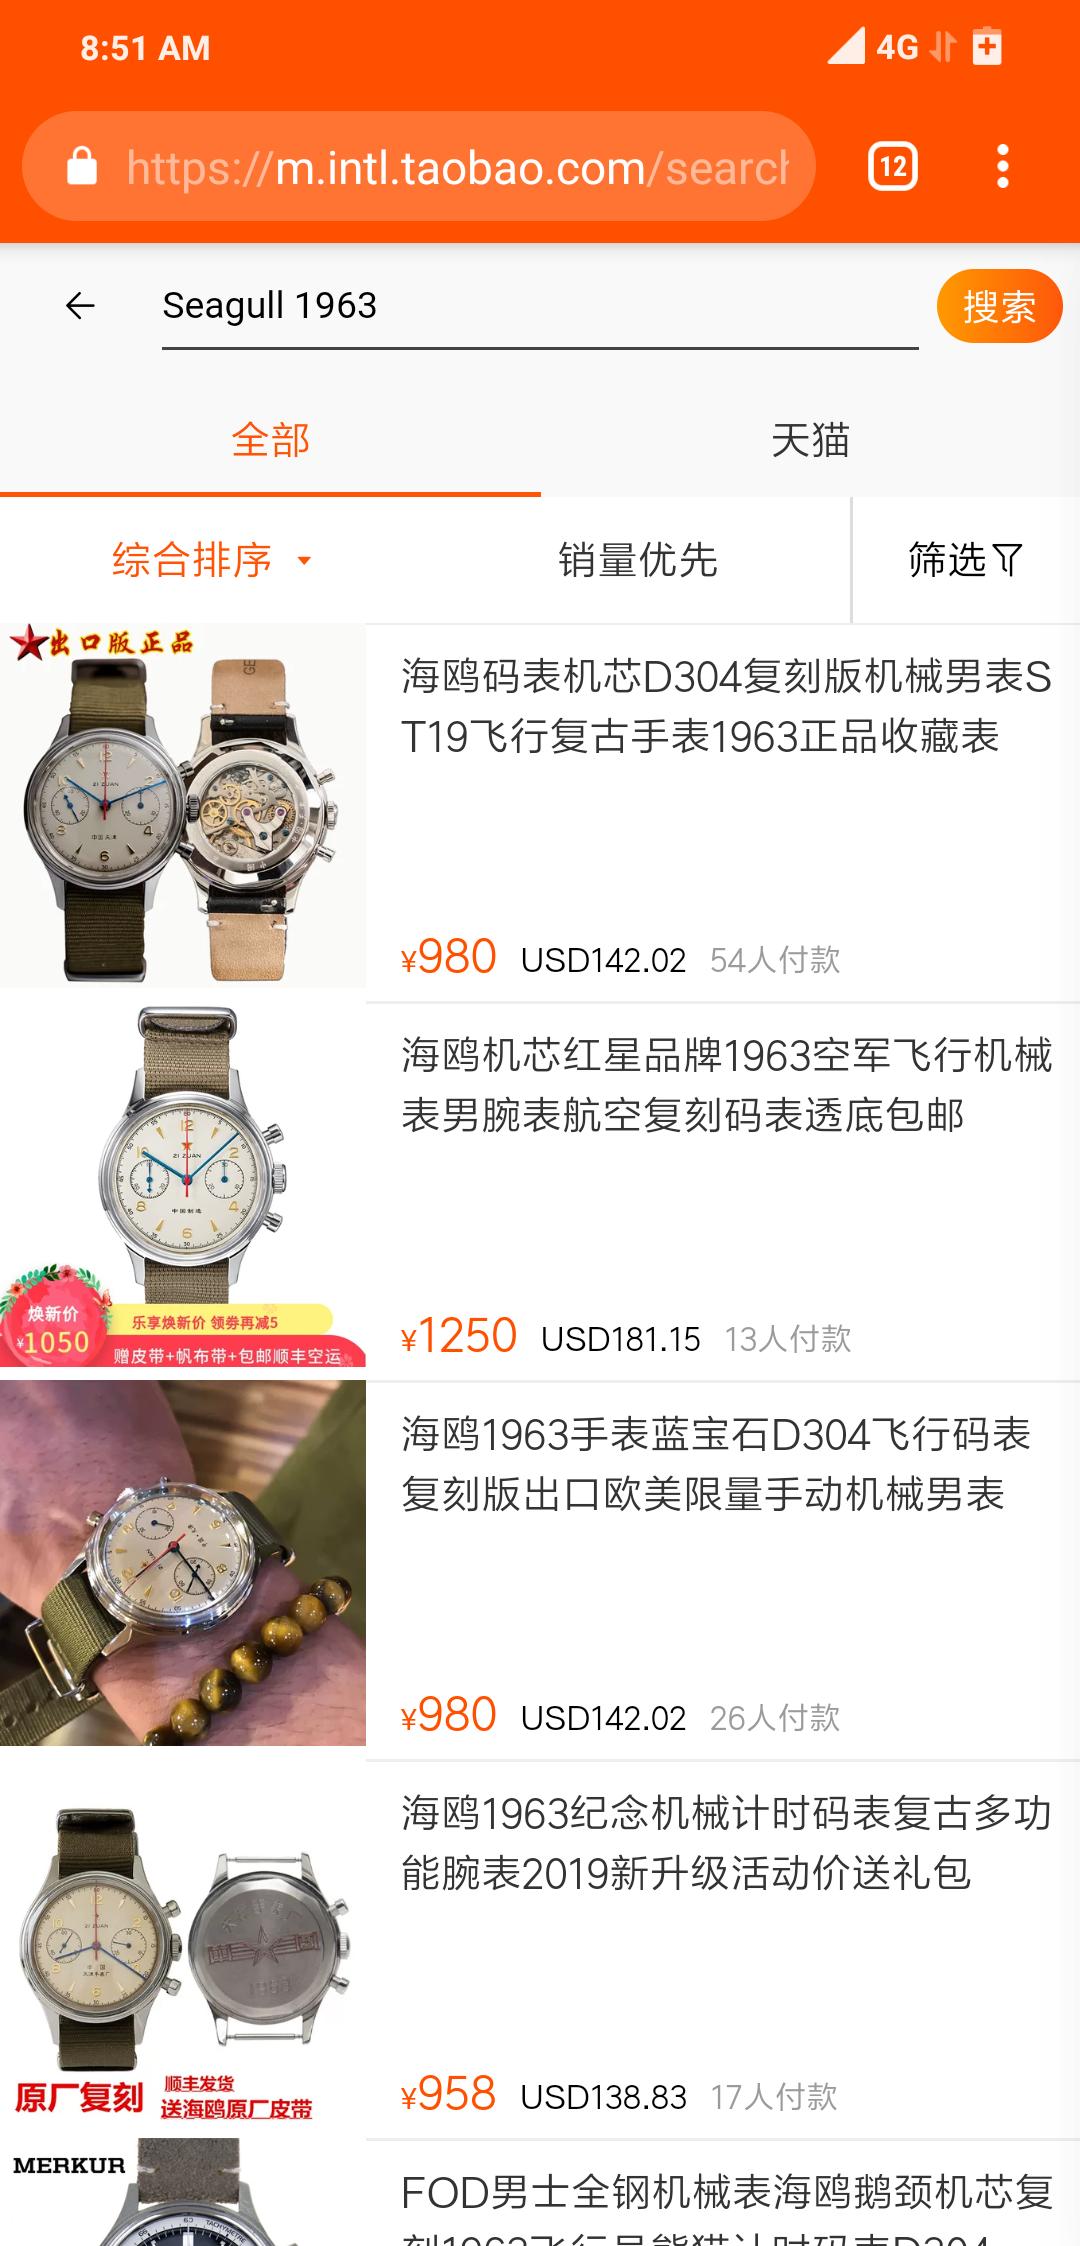 Name:  Screenshot_2019-05-31-08-51-11-982_com_1559273578700.android.chrome.png Views: 75 Size:  888.5 KB